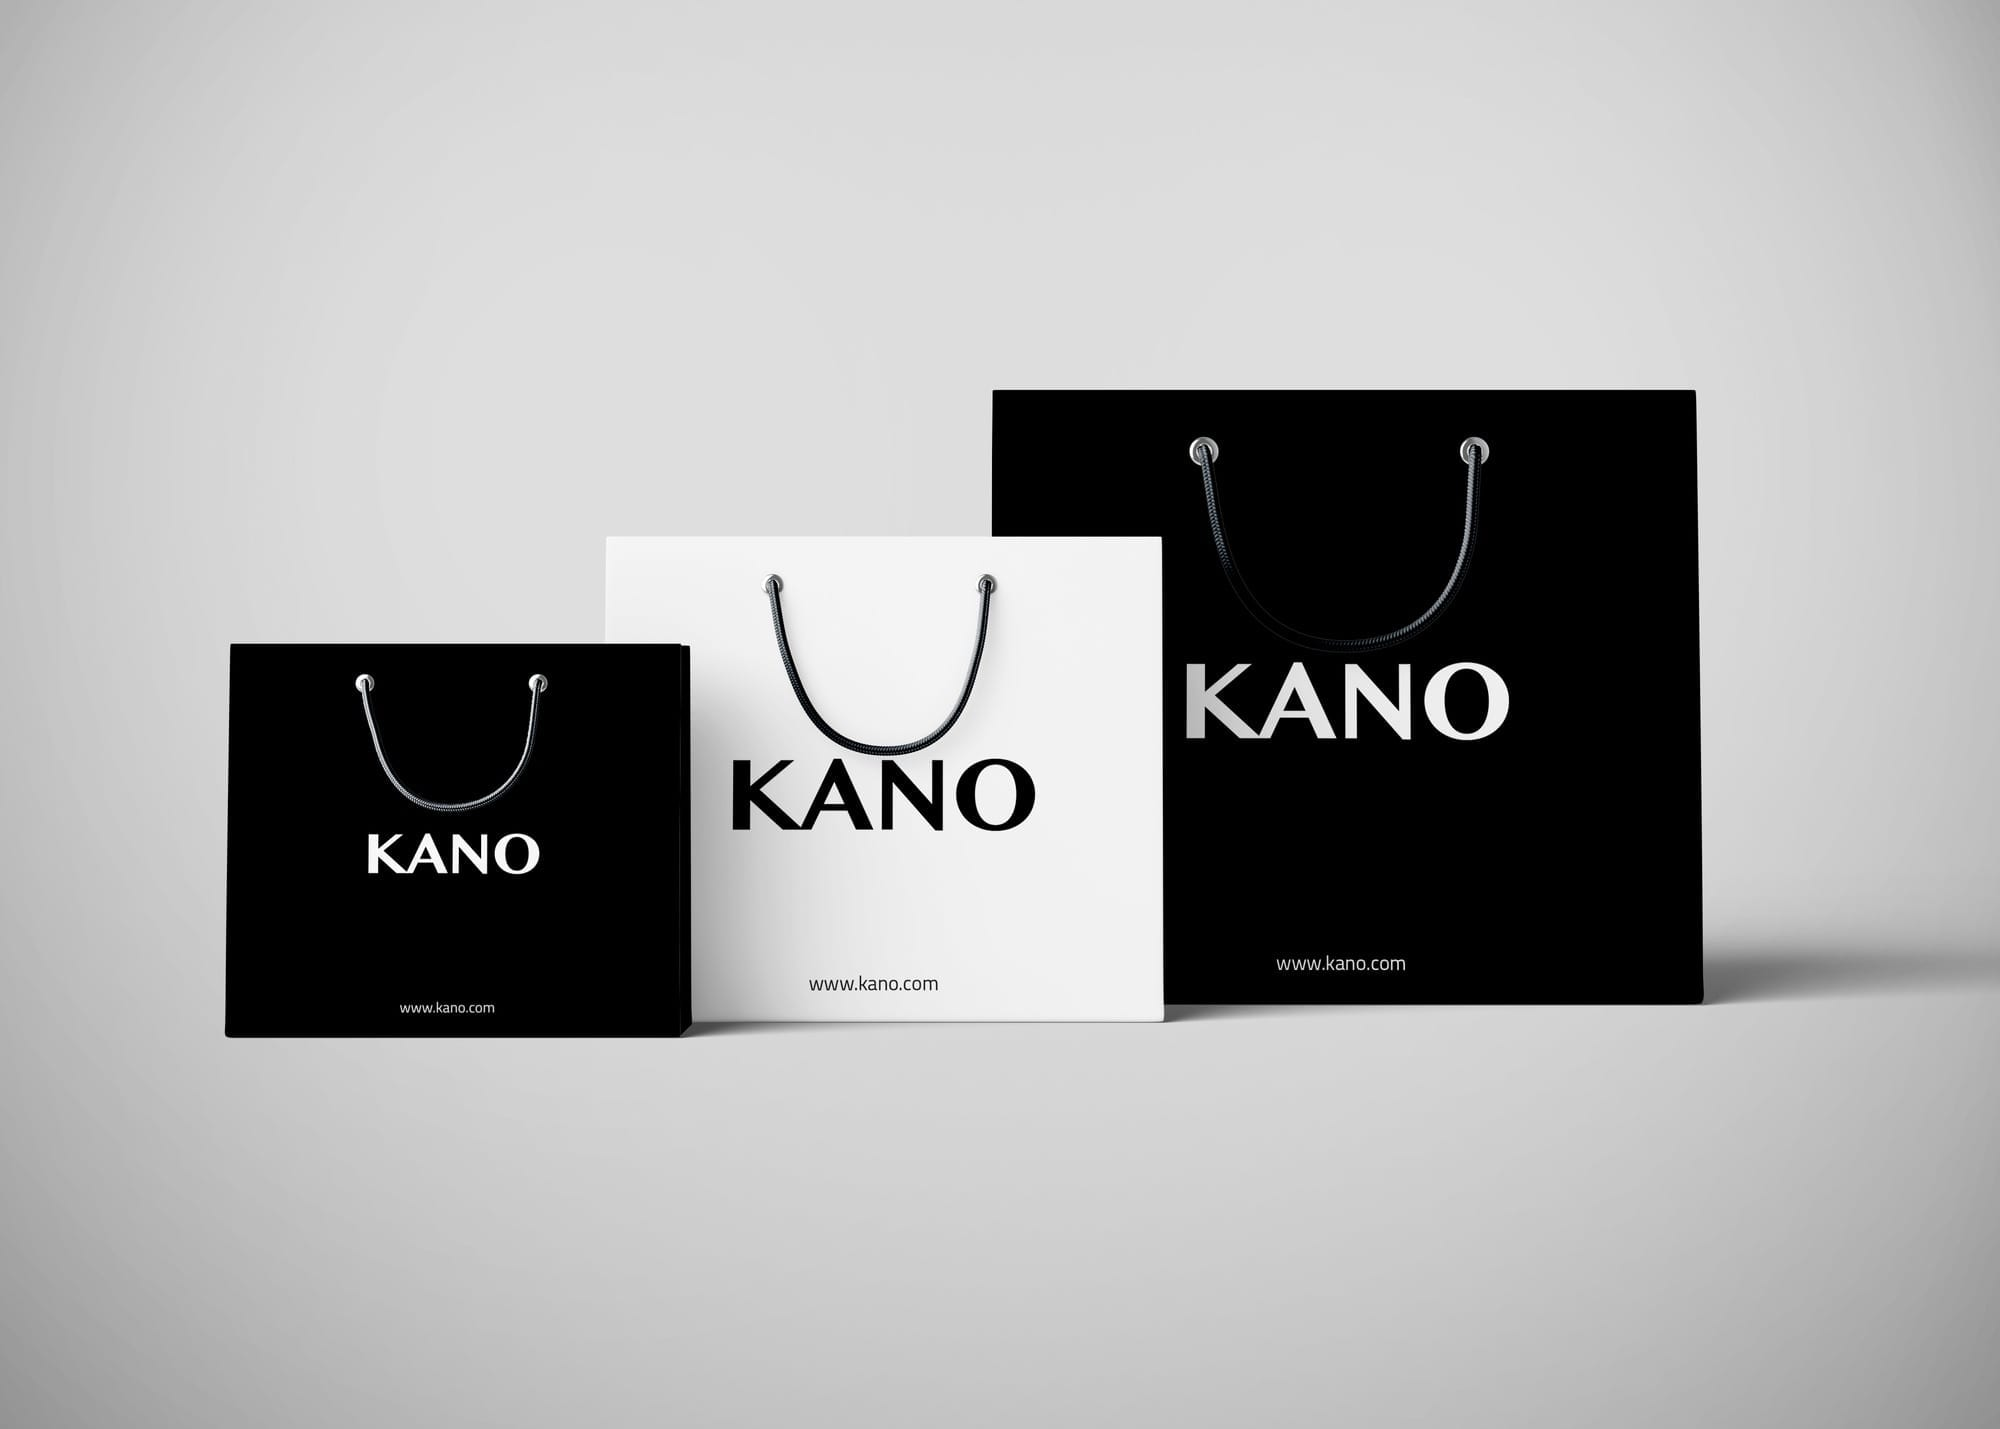 kano bags2